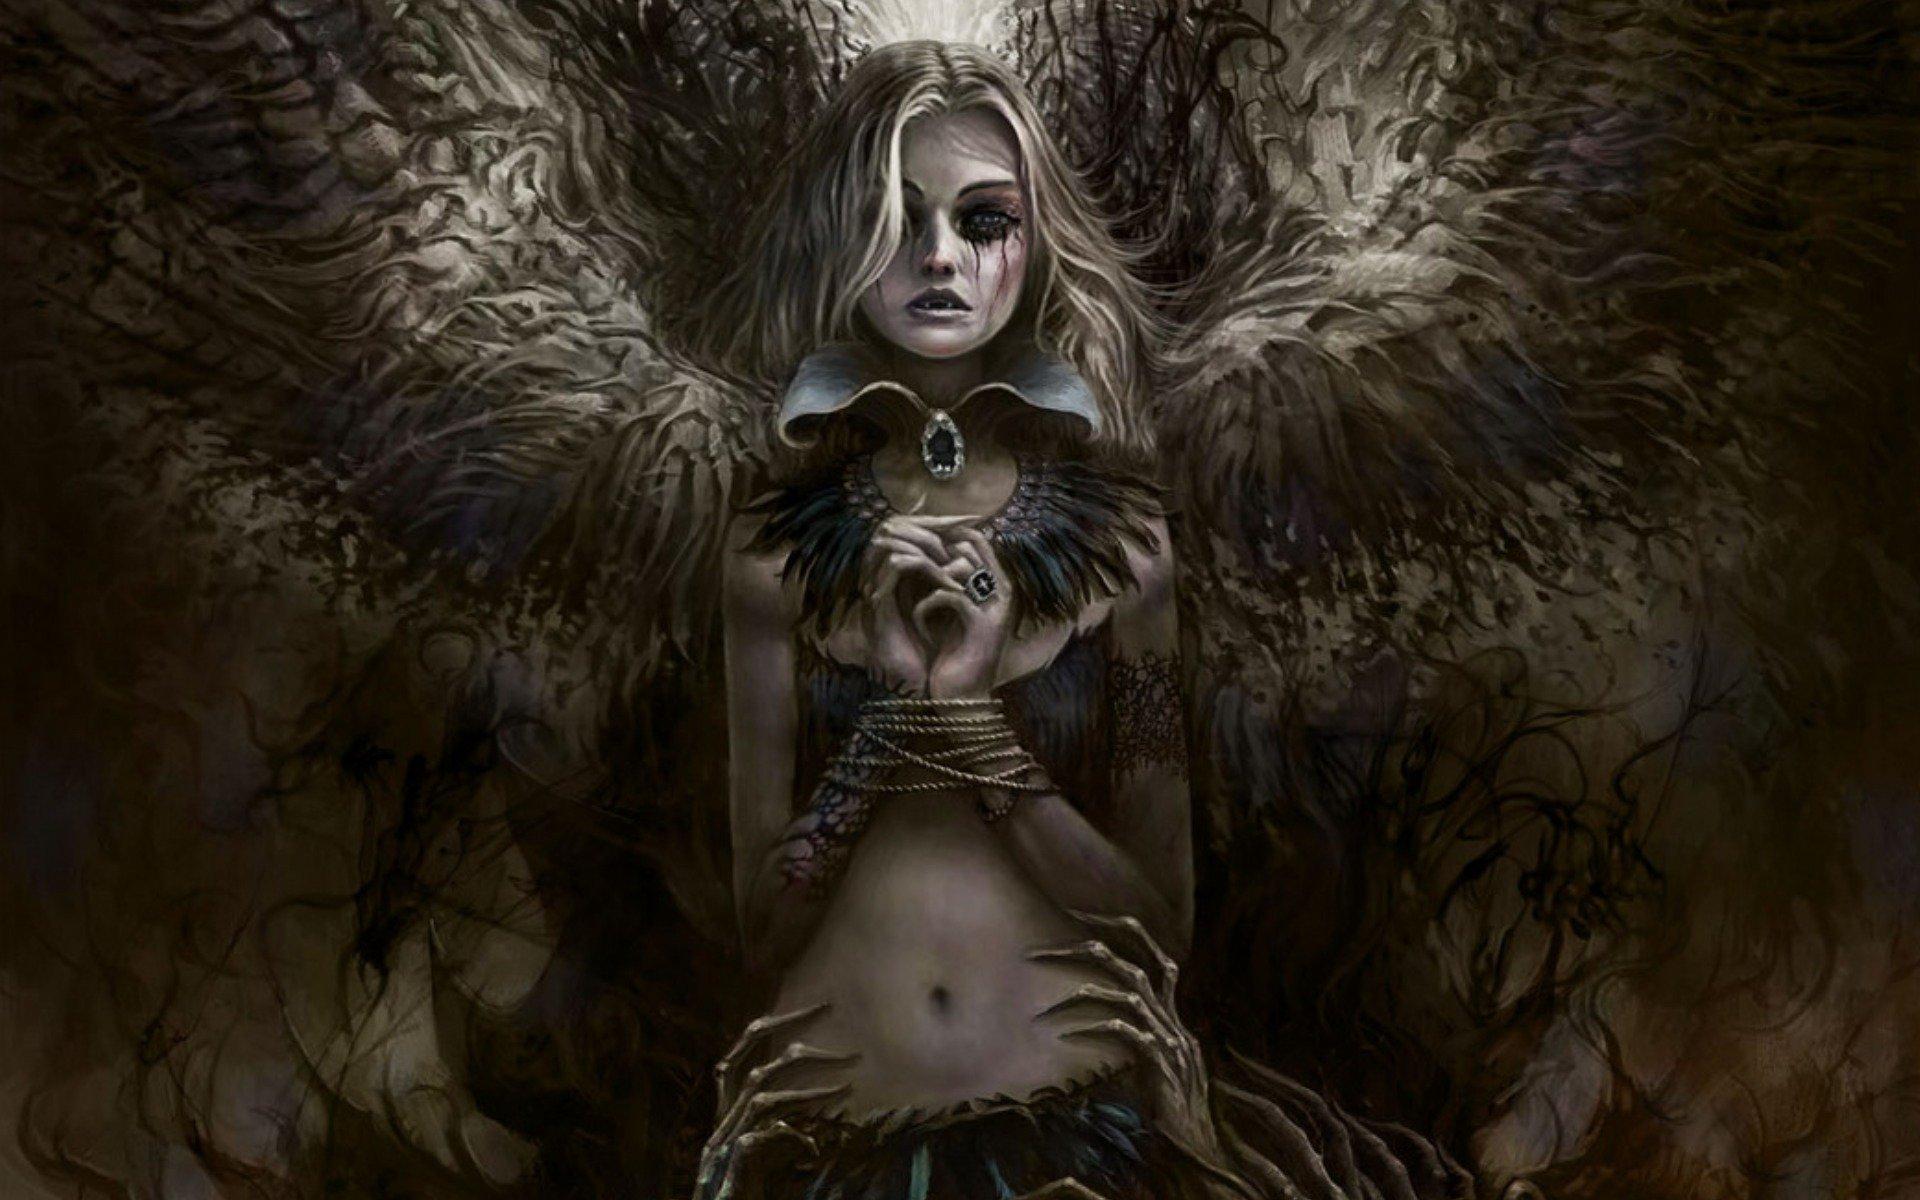 богиня зла картинки побег имеет серо-буроватый